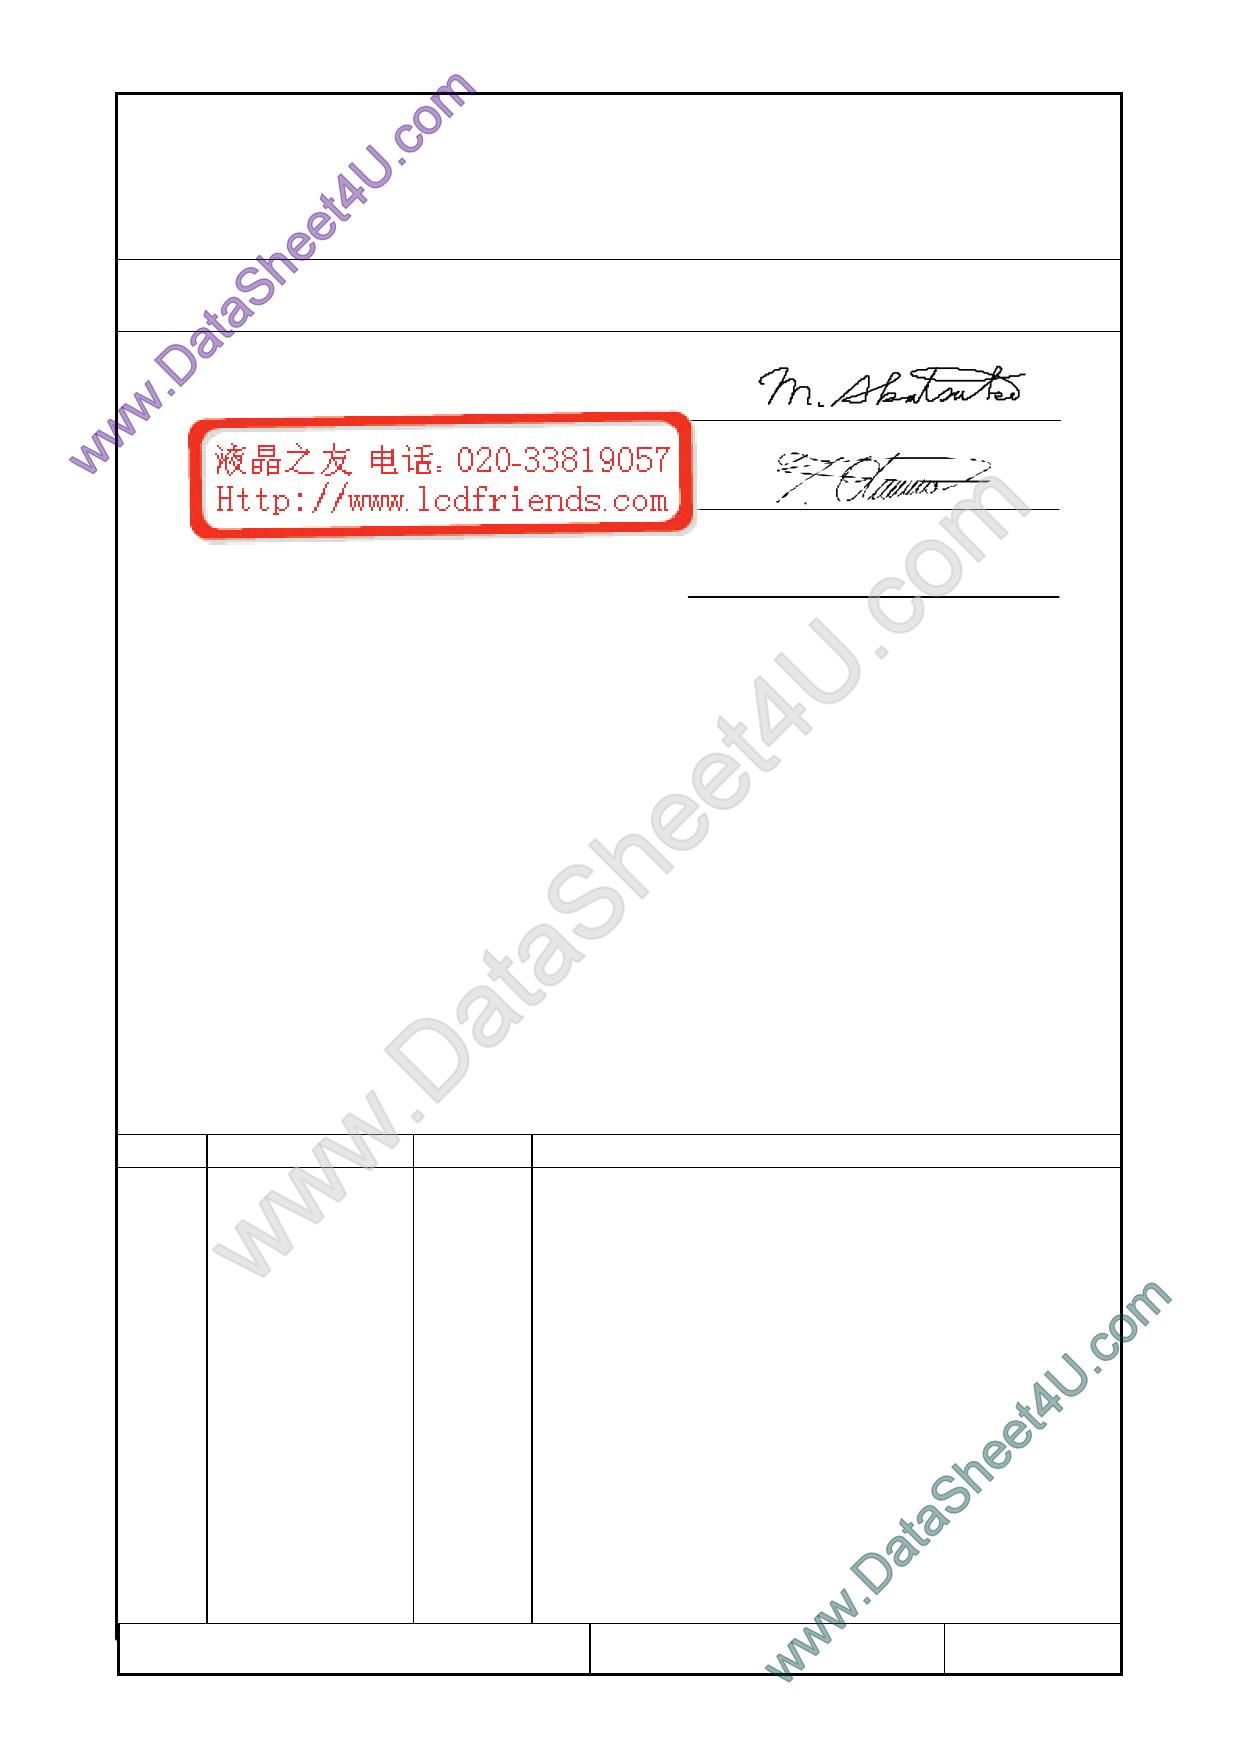 F-51851GNFQJ-LY-ADN Даташит, Описание, Даташиты